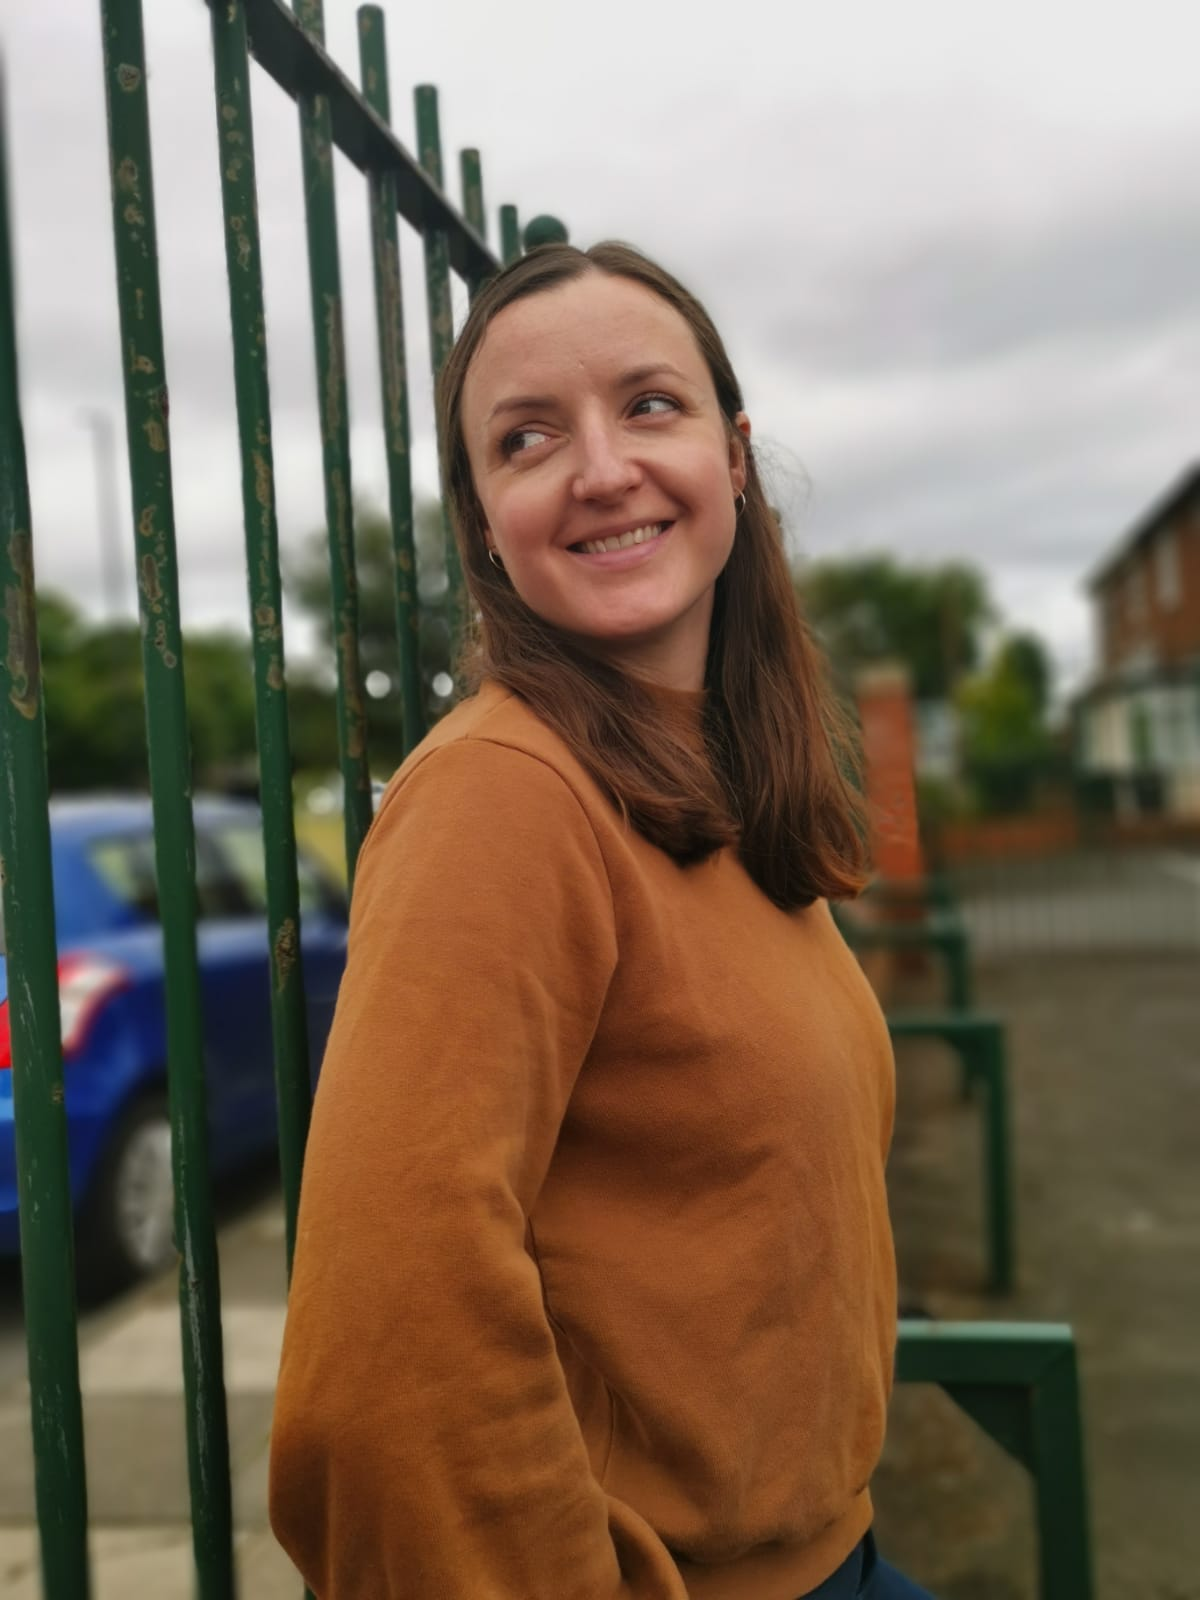 Francesca Yates, founder of &pause